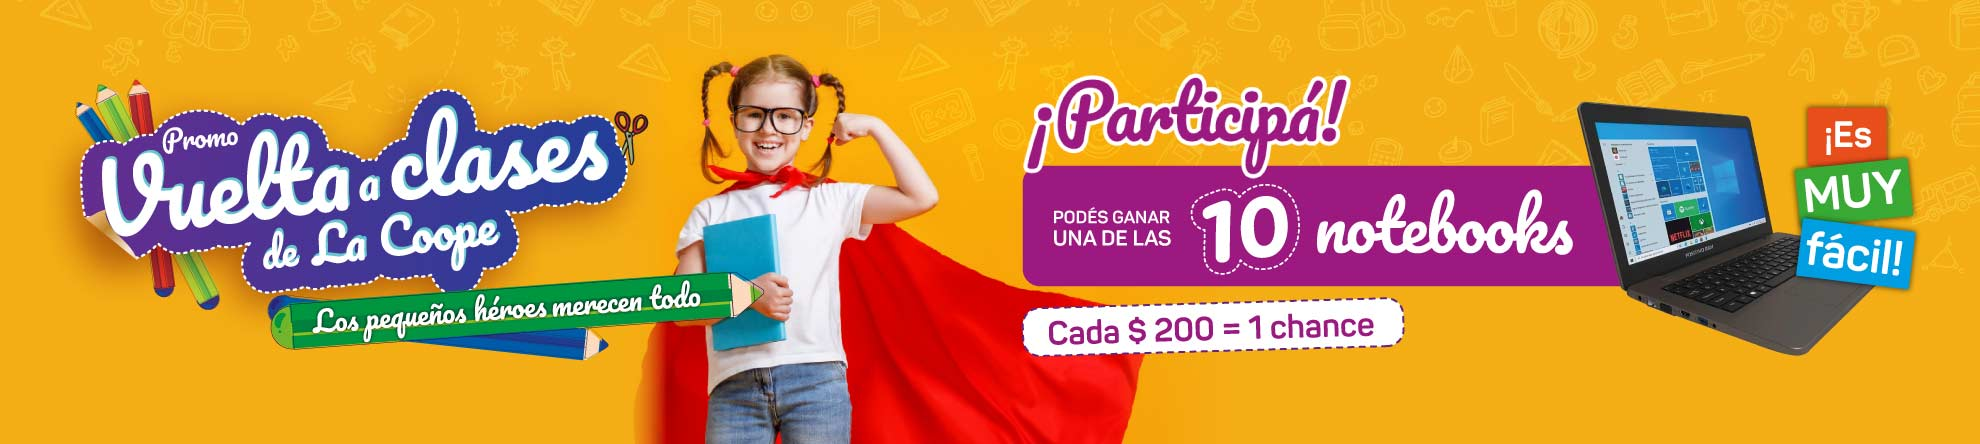 slide-promo-vuelta-clases